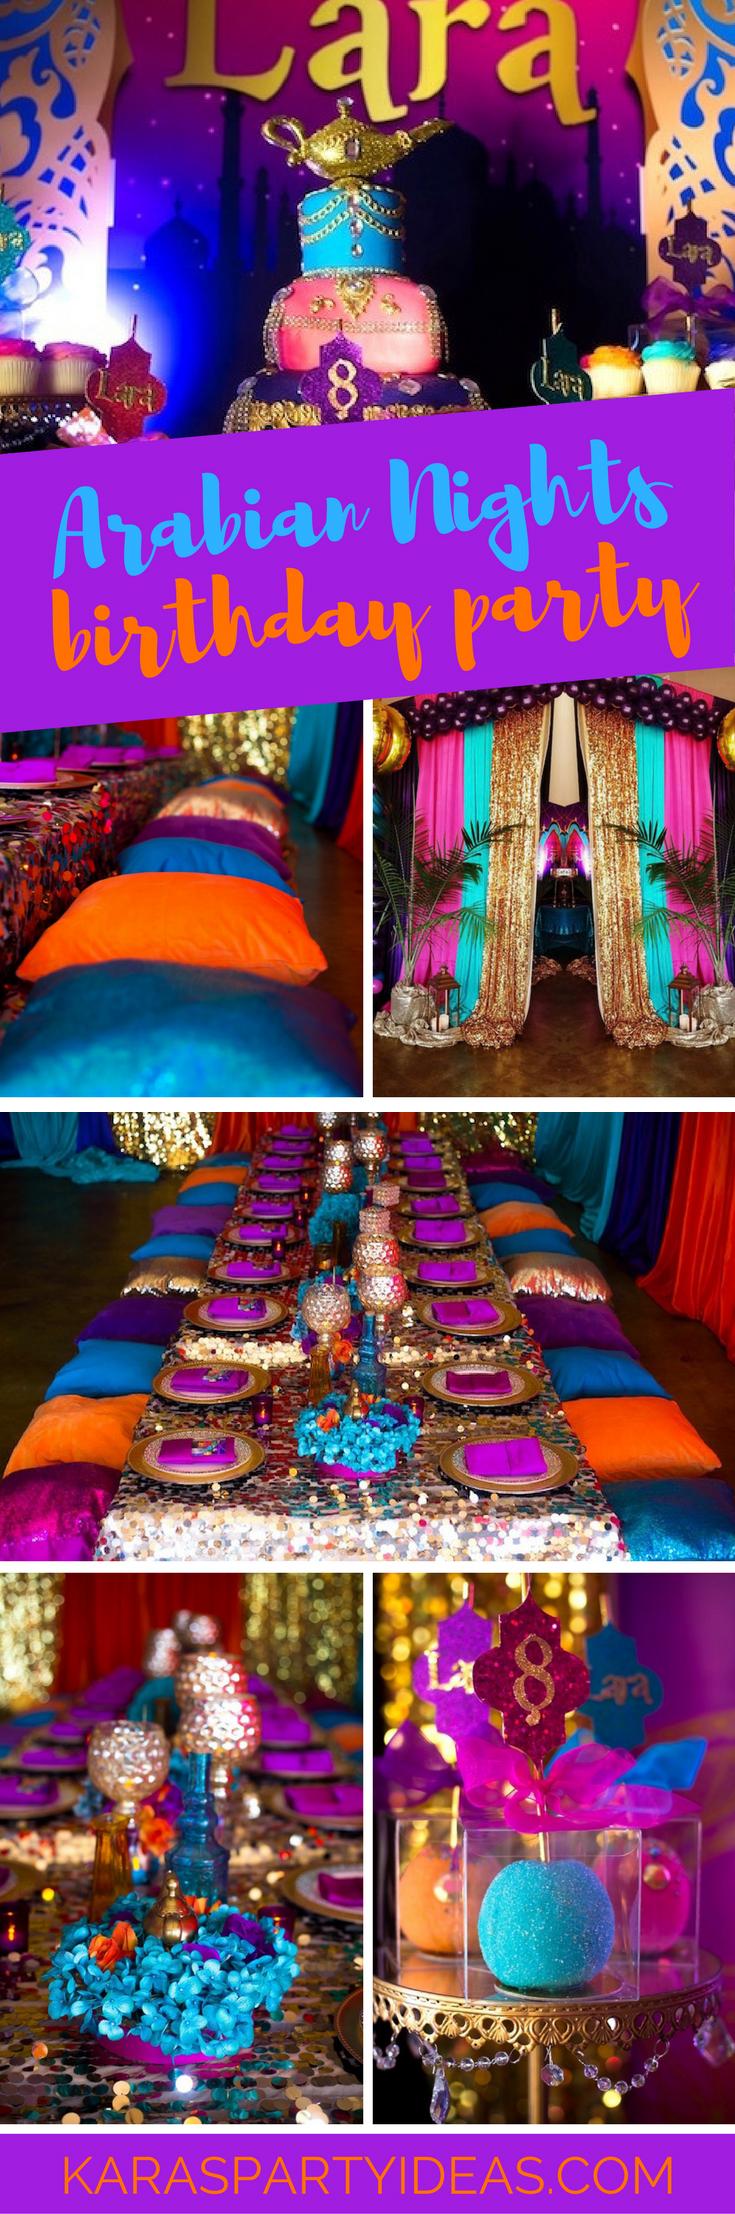 Arabian Nights Birthday Party via Kara's Party Ideas - KarasPartyIdeas.com